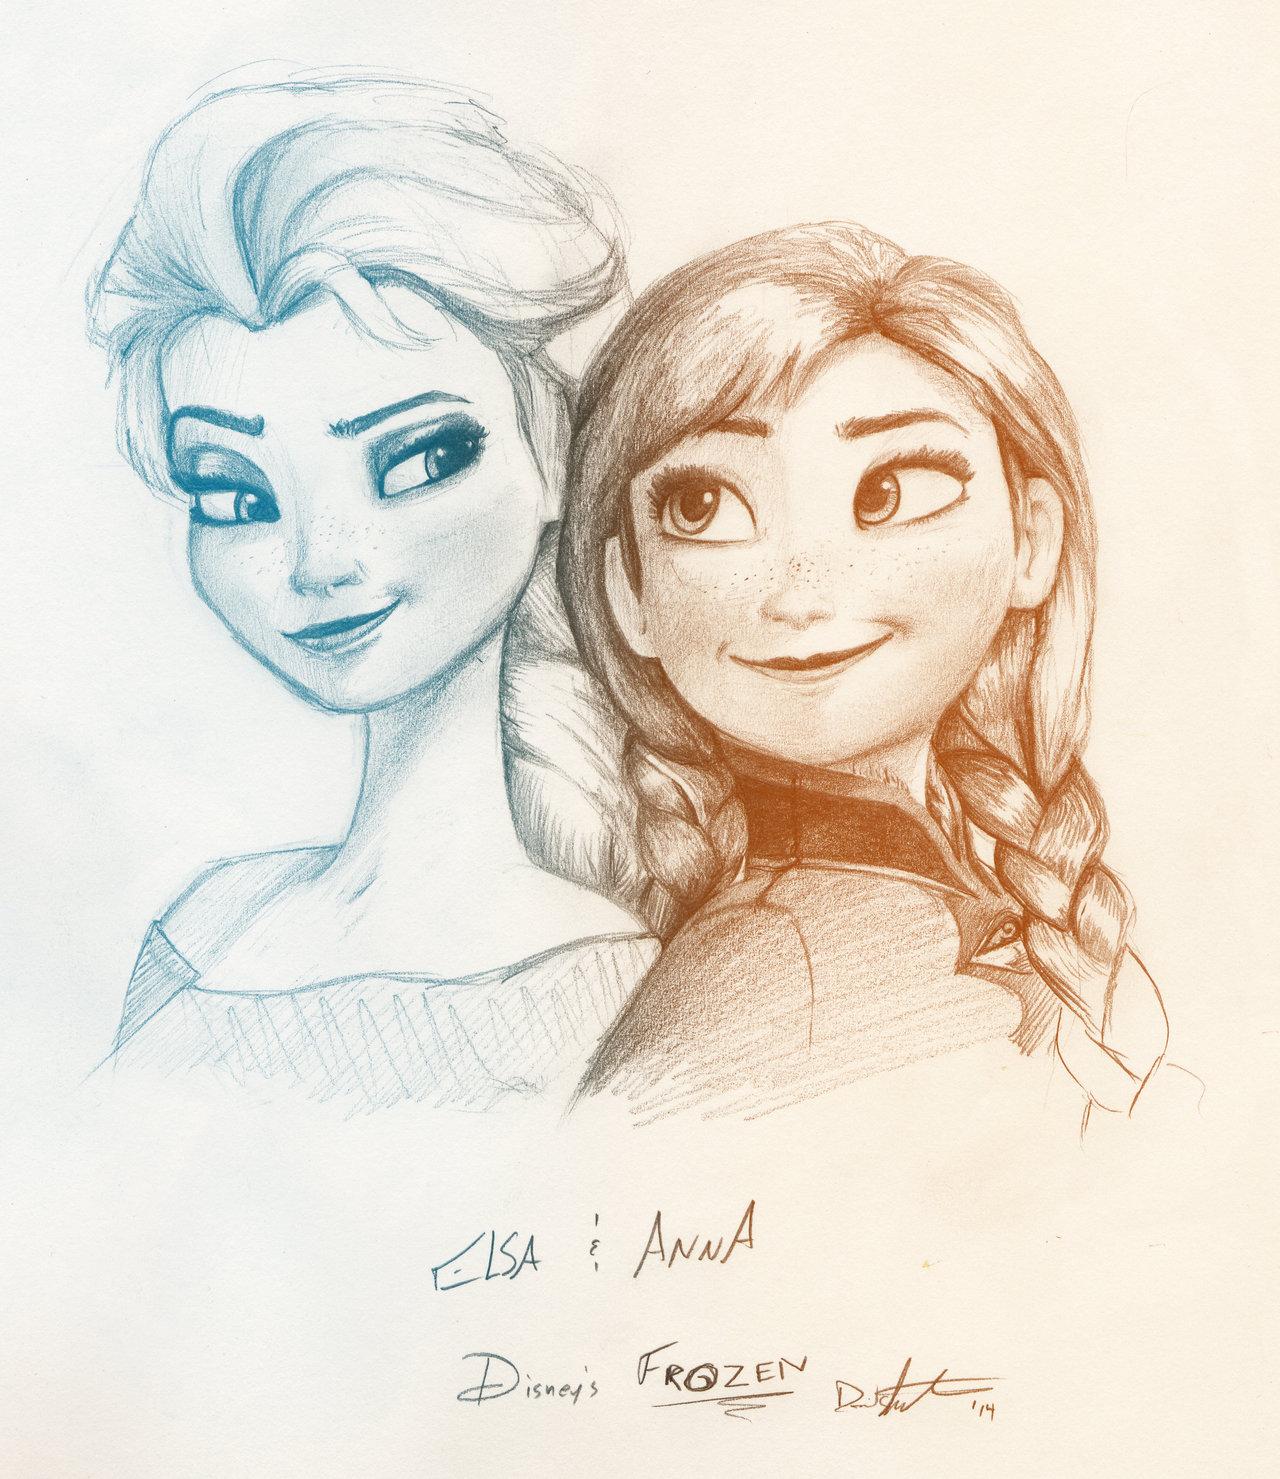 1280x1479 Elsa I Anna I Inspiracje Na Rysunki Lt3